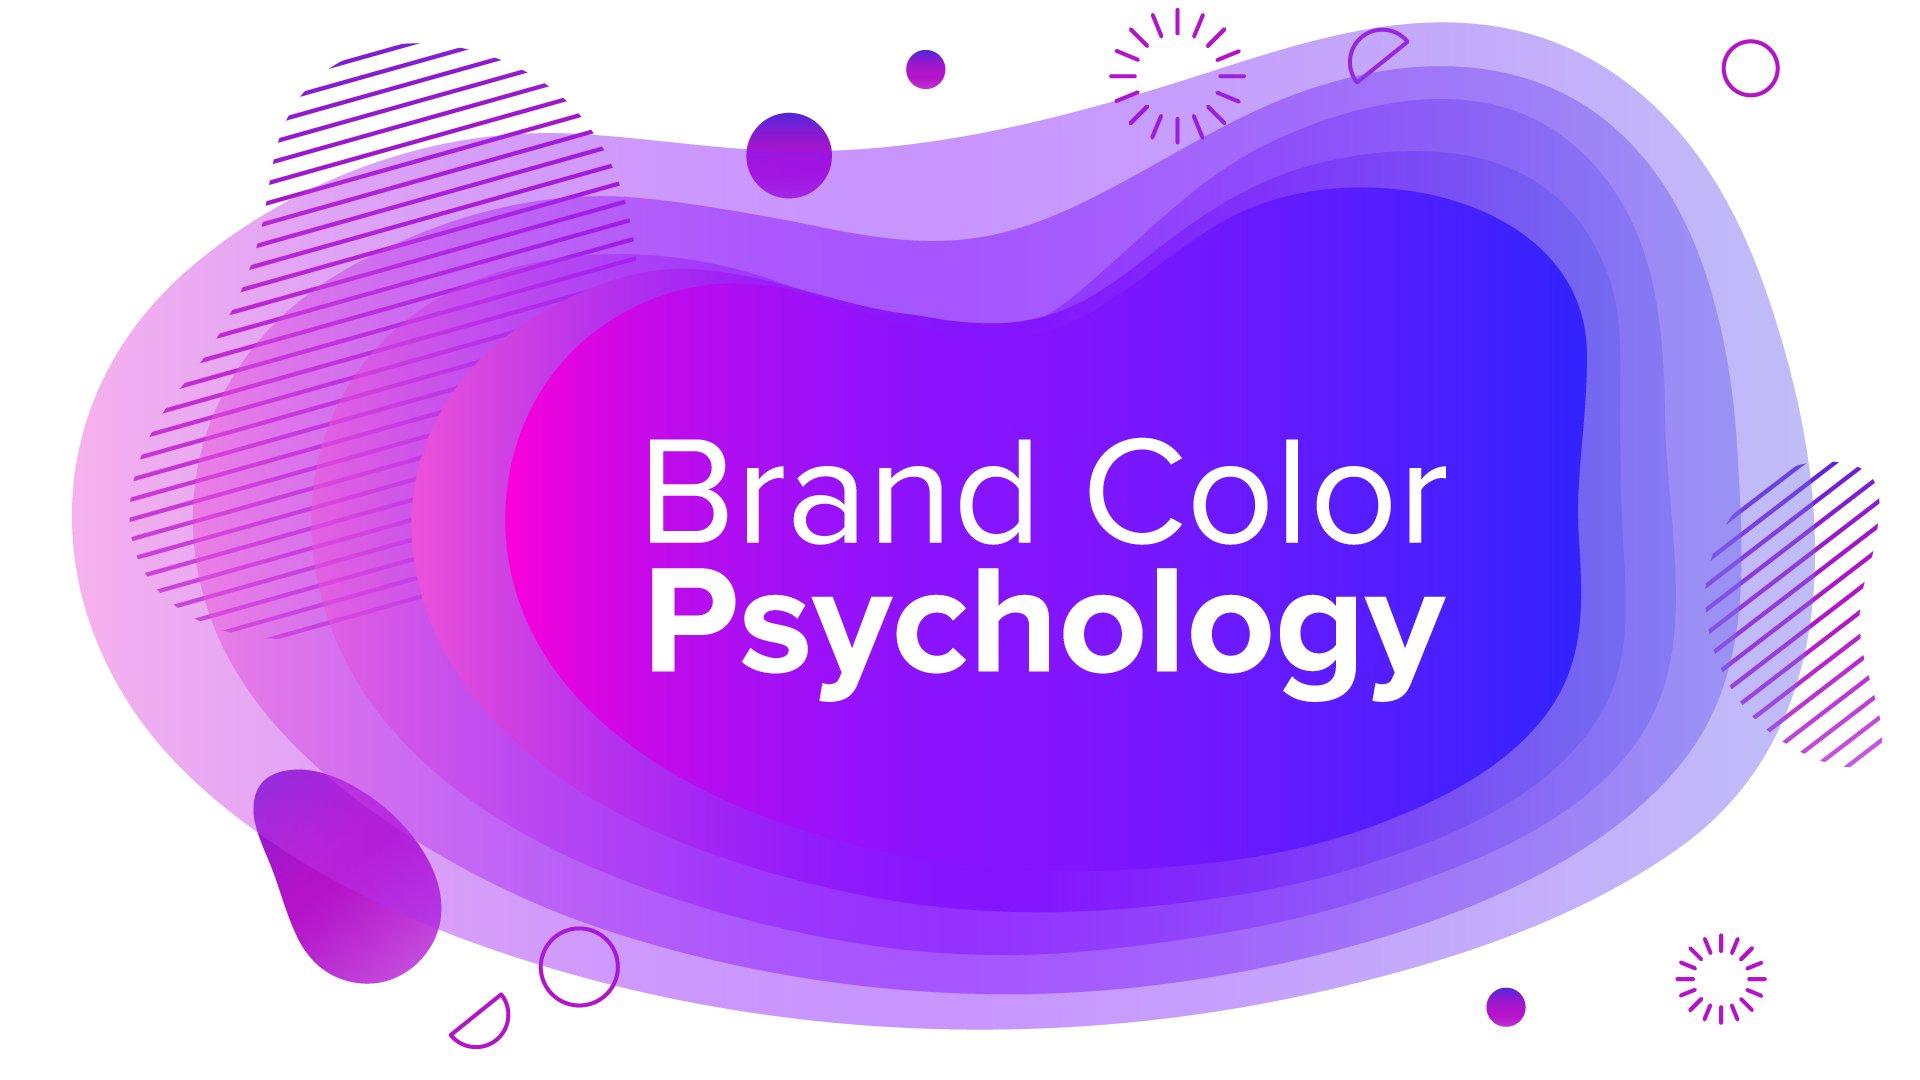 Brand color psychology graphic design